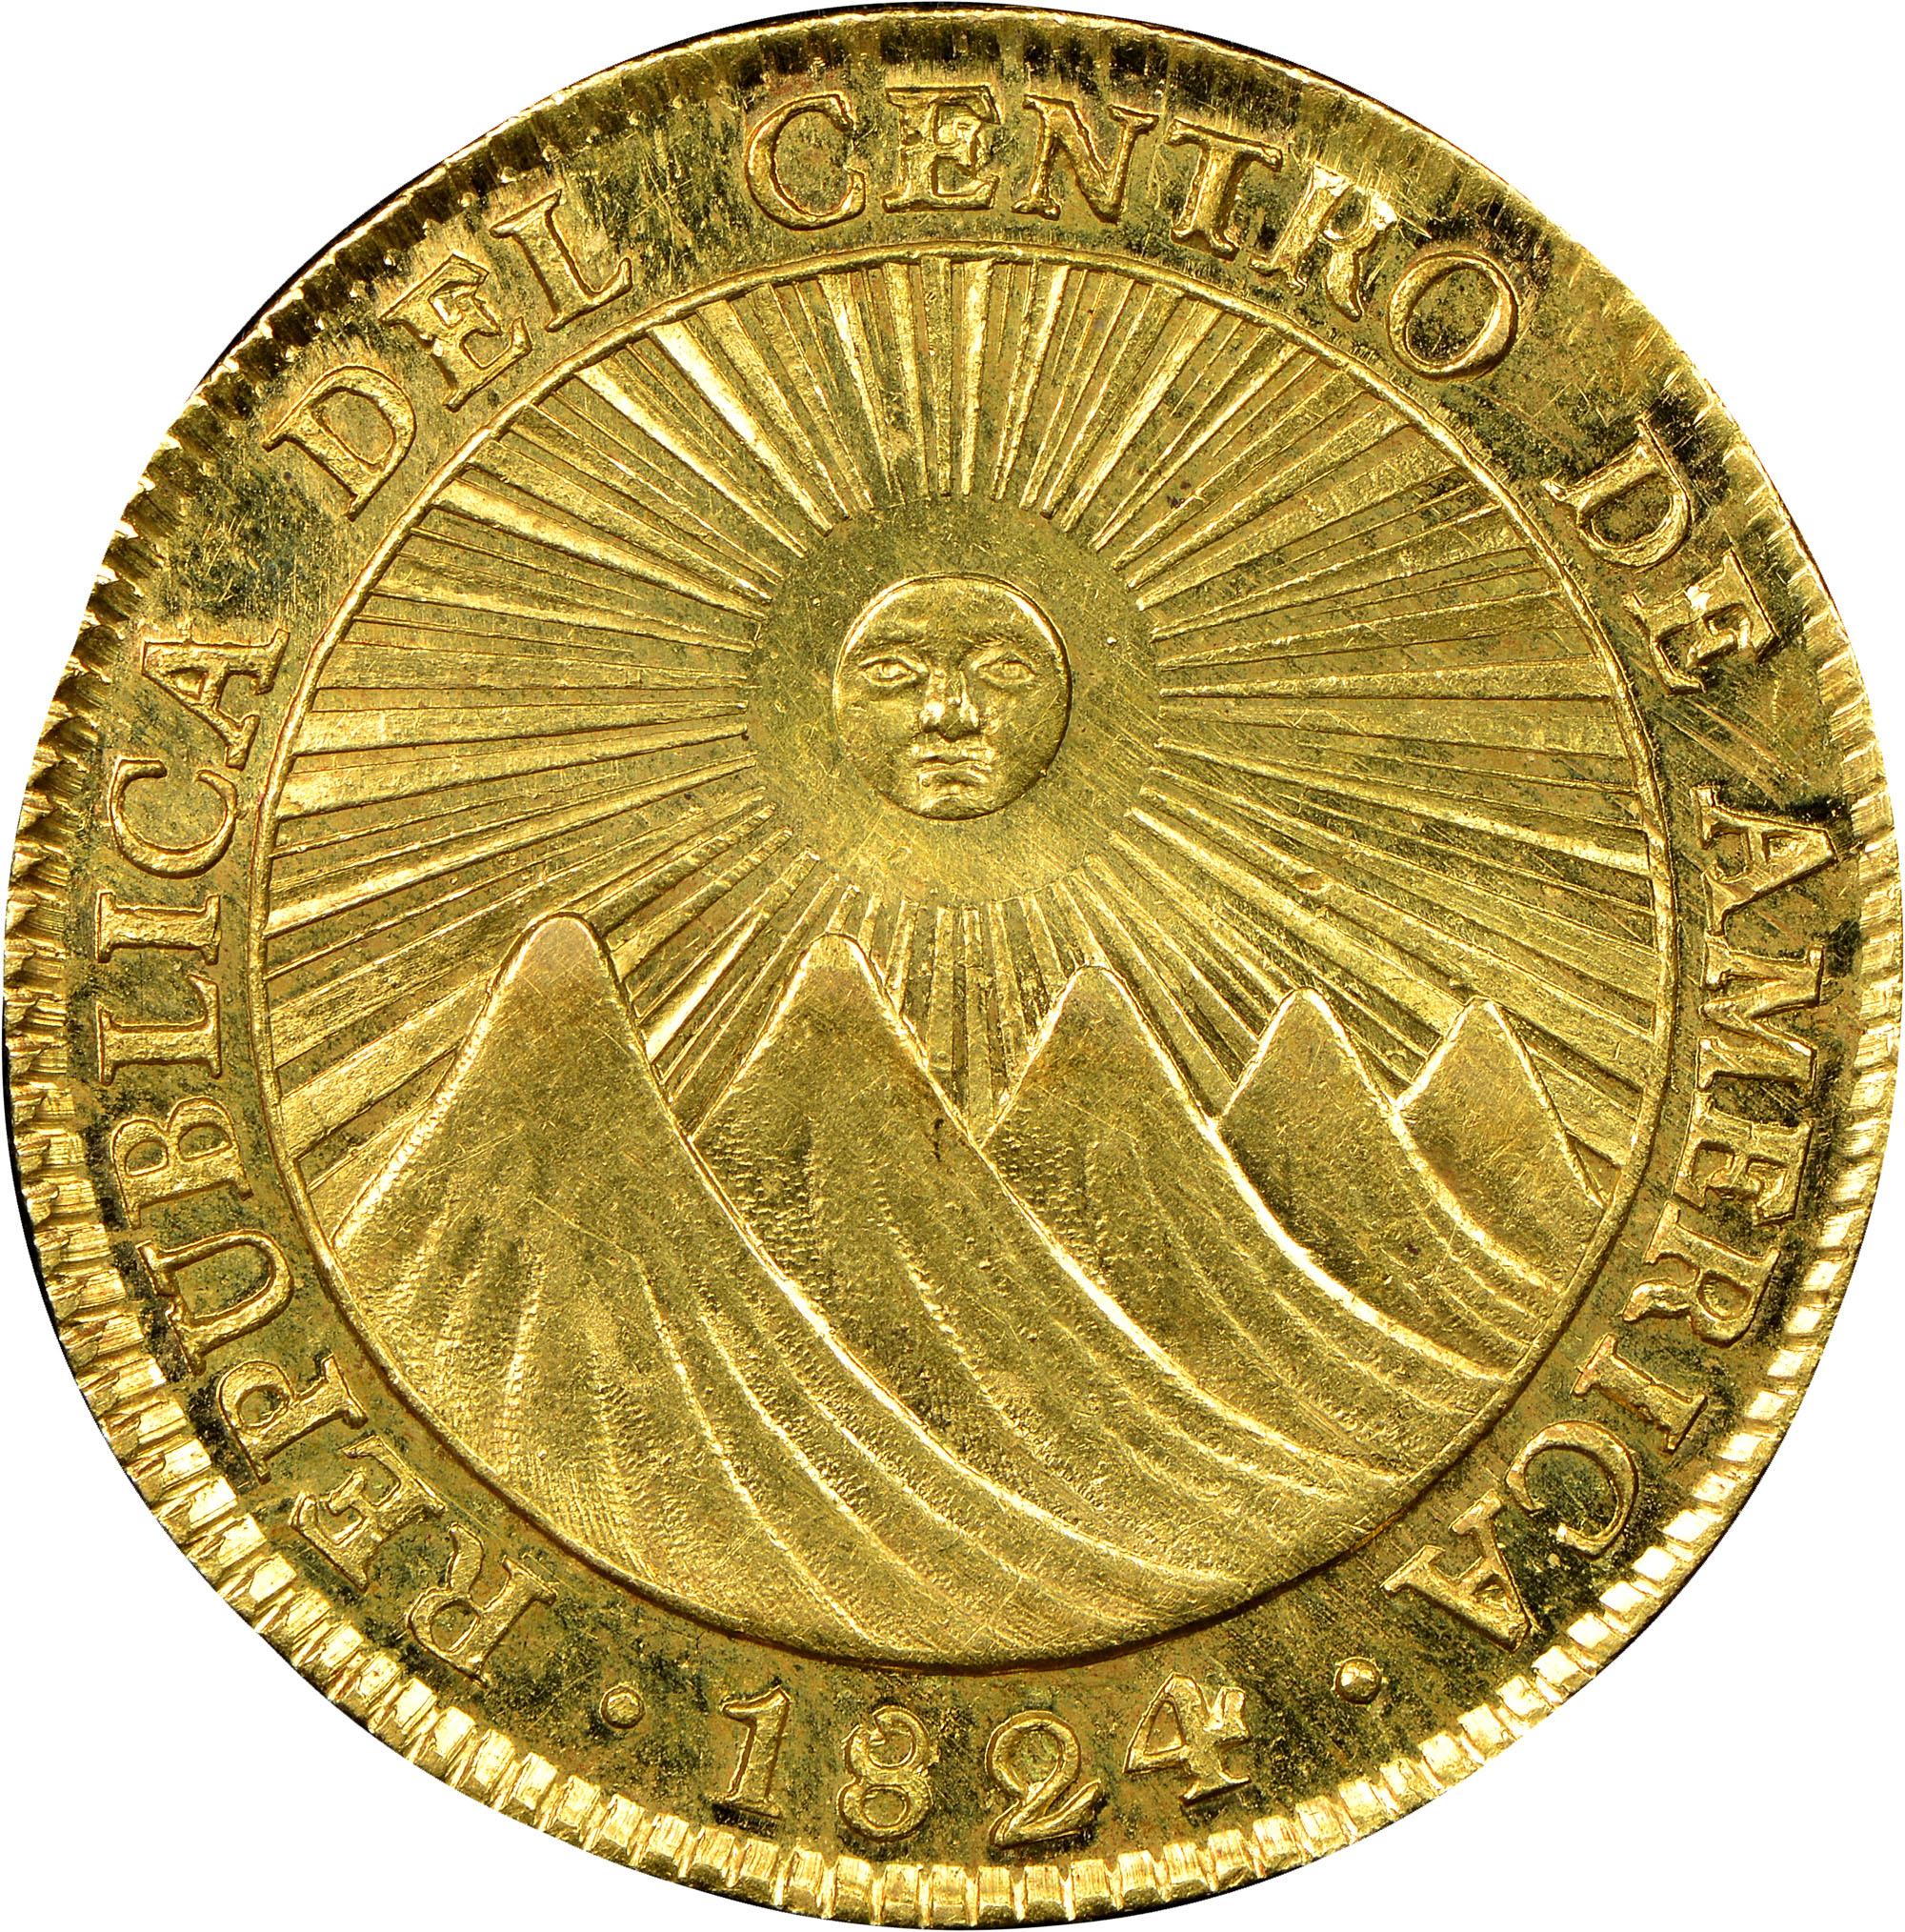 1824-1825 Central American Republic 4 Escudos obverse